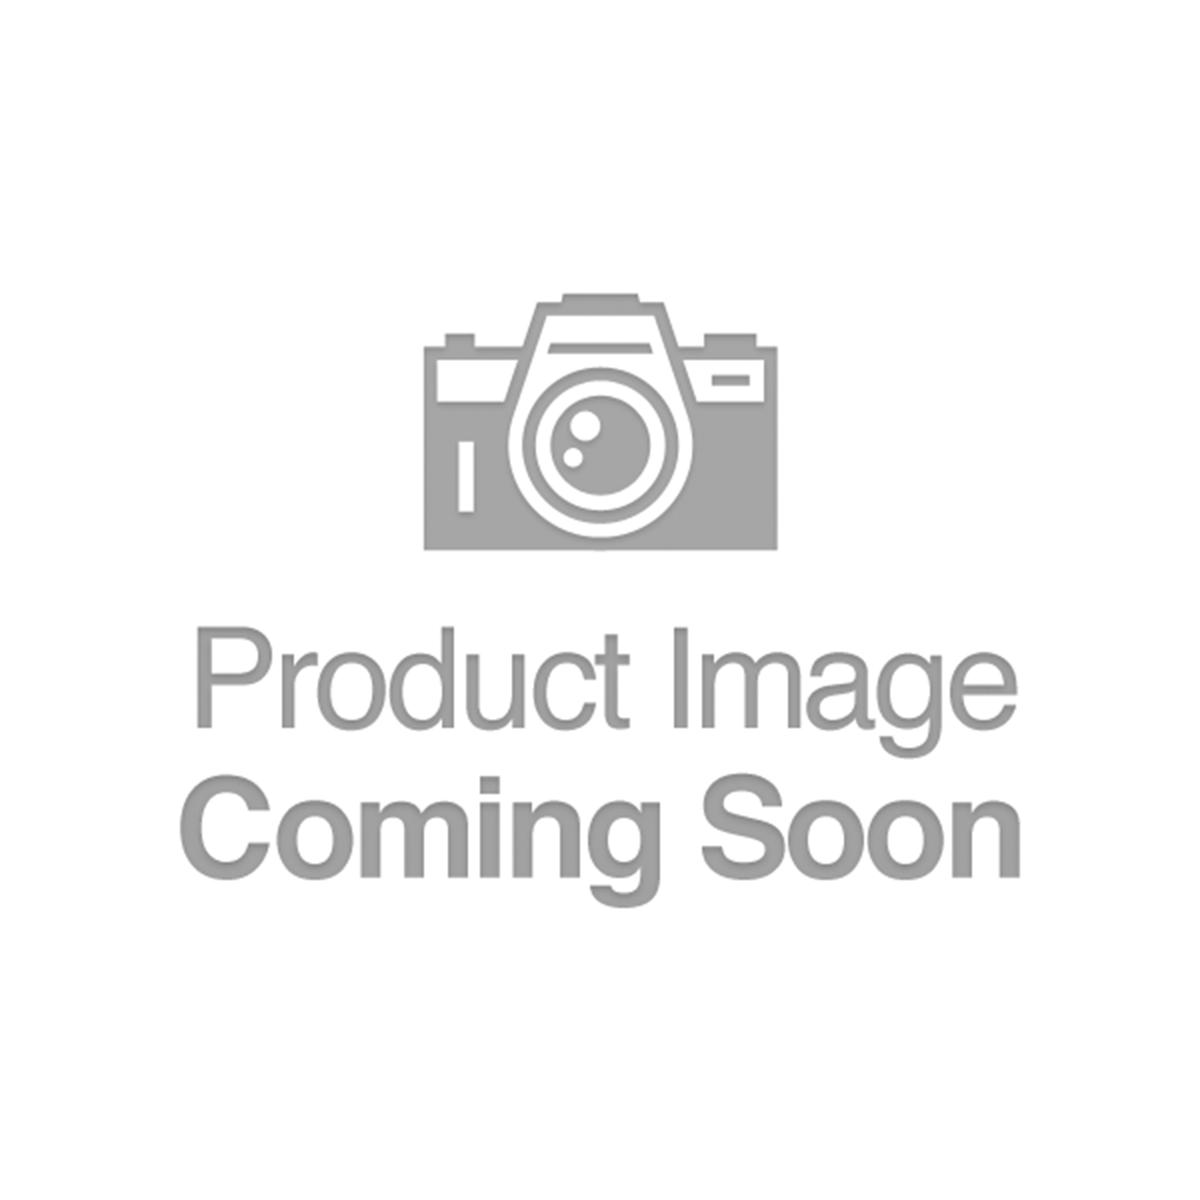 2008-W $5 American Buffalo Gold Buffalos - $5 Gold Buffalos PCGS MS69